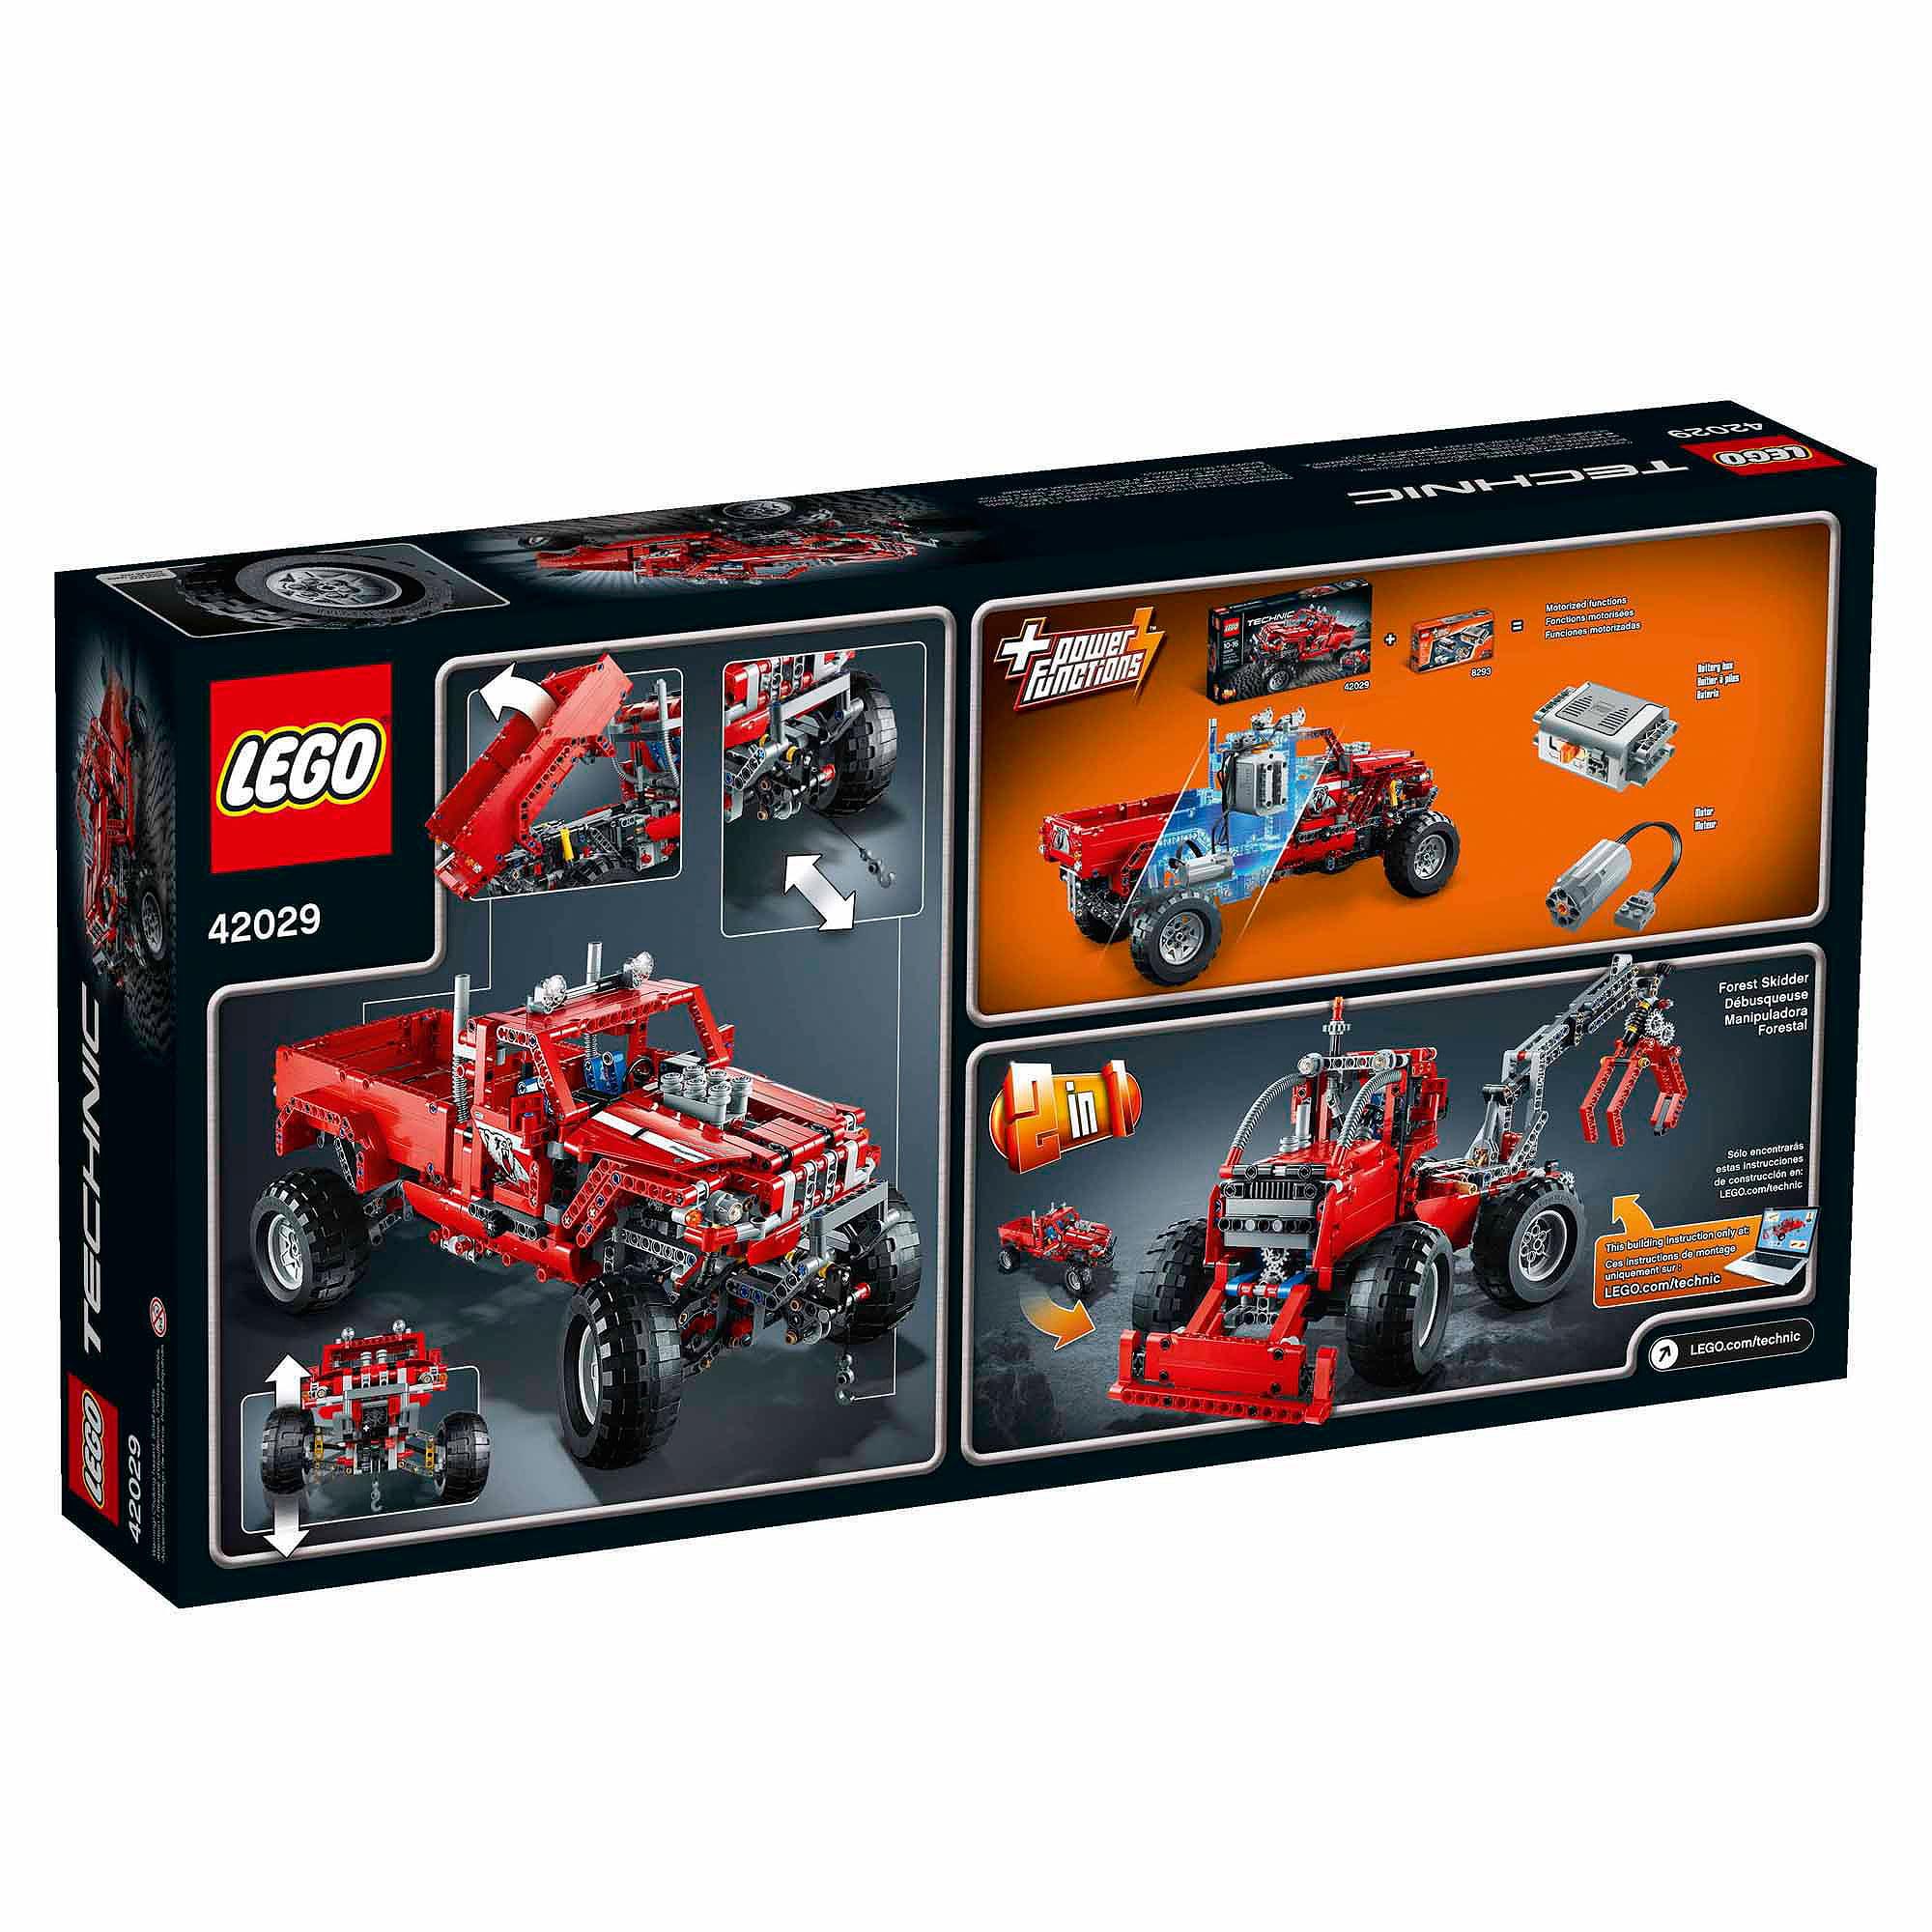 Lego Technic Customized Pick Up Truck Walmart